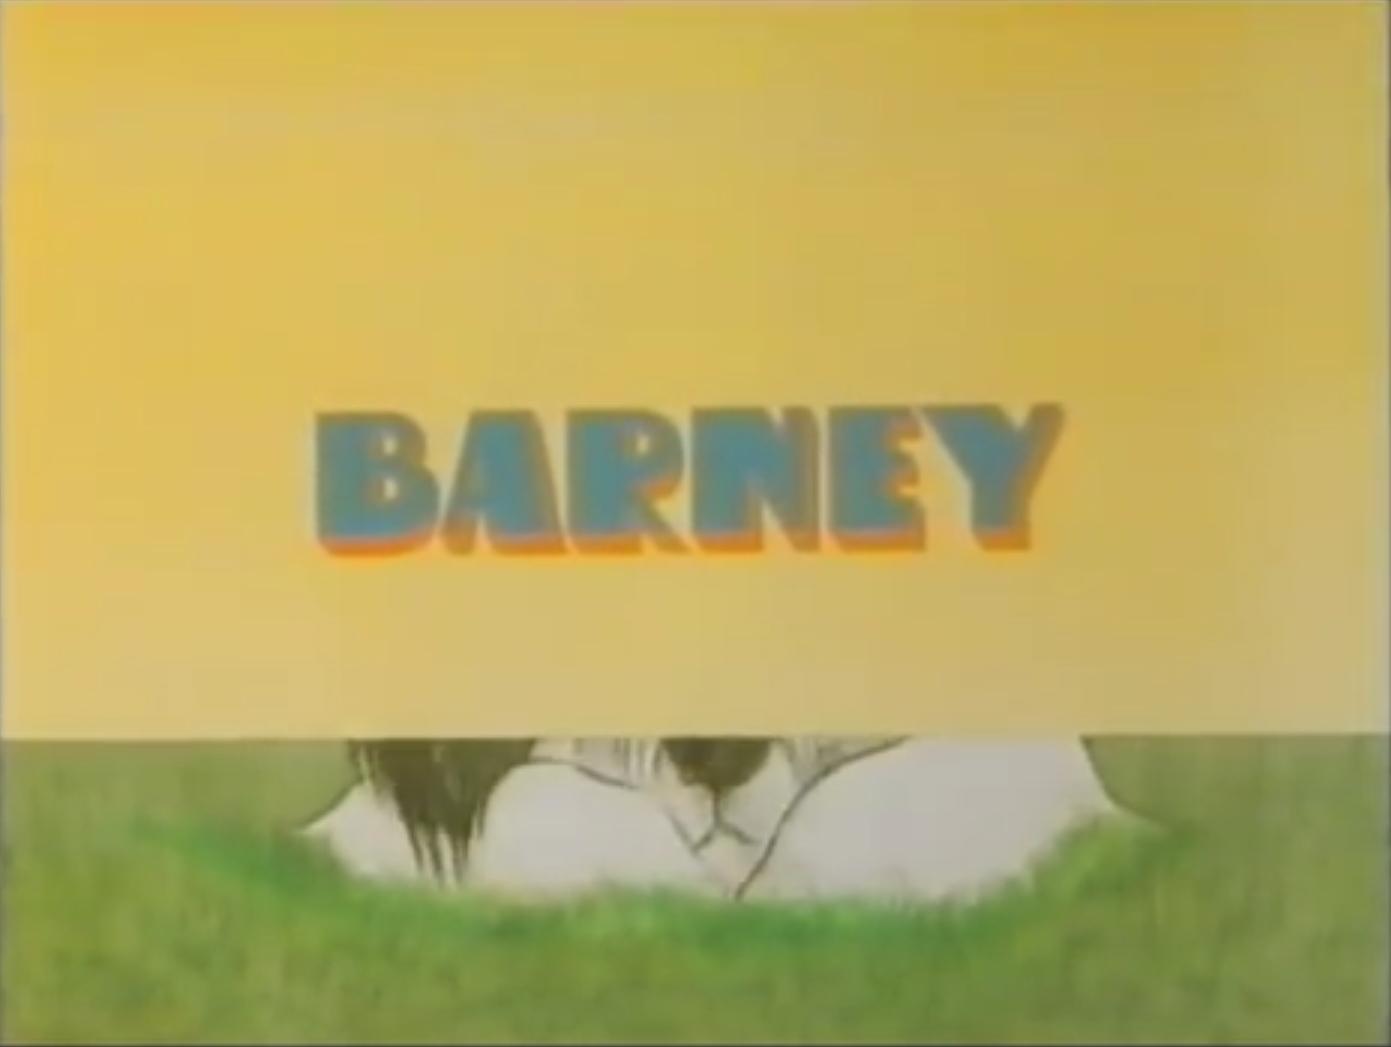 Barney (TV series)